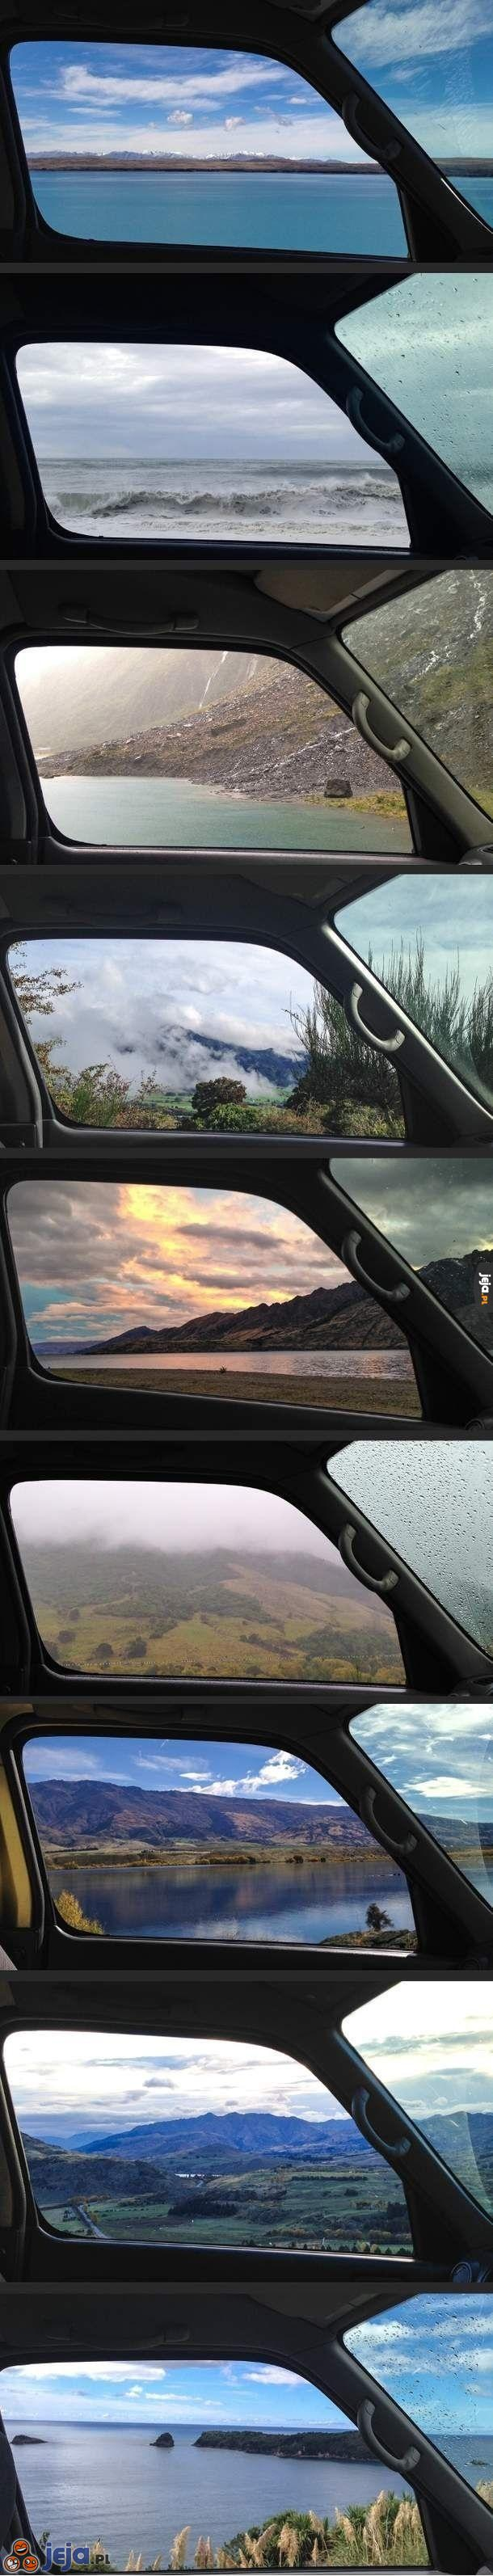 Nowa Zelandia z okna samochodu